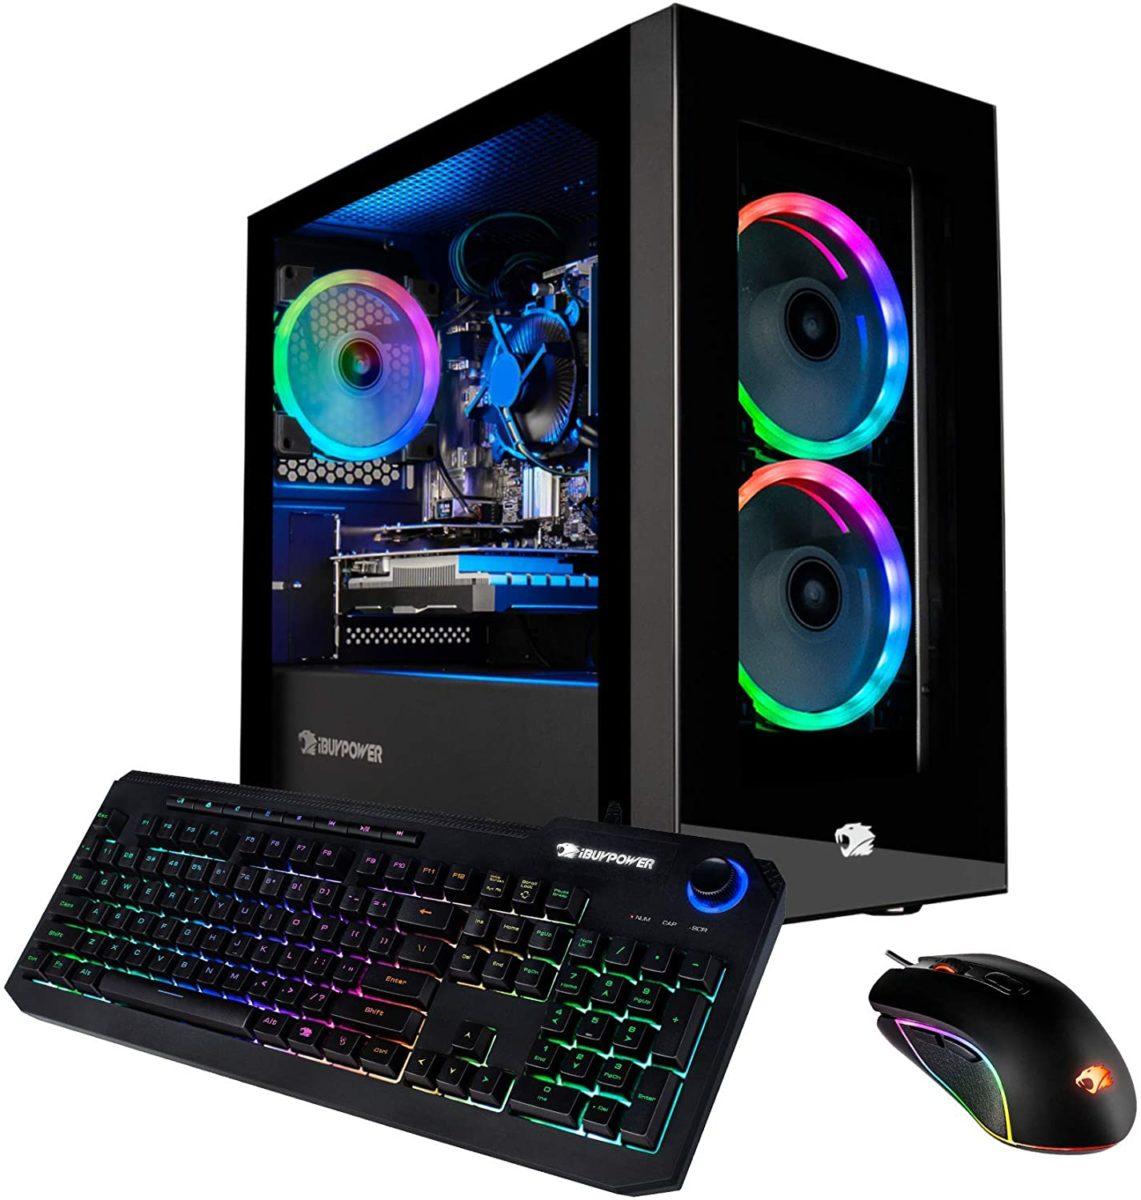 iBUYPOWER Pro Gaming PC (Element Mini 9300)